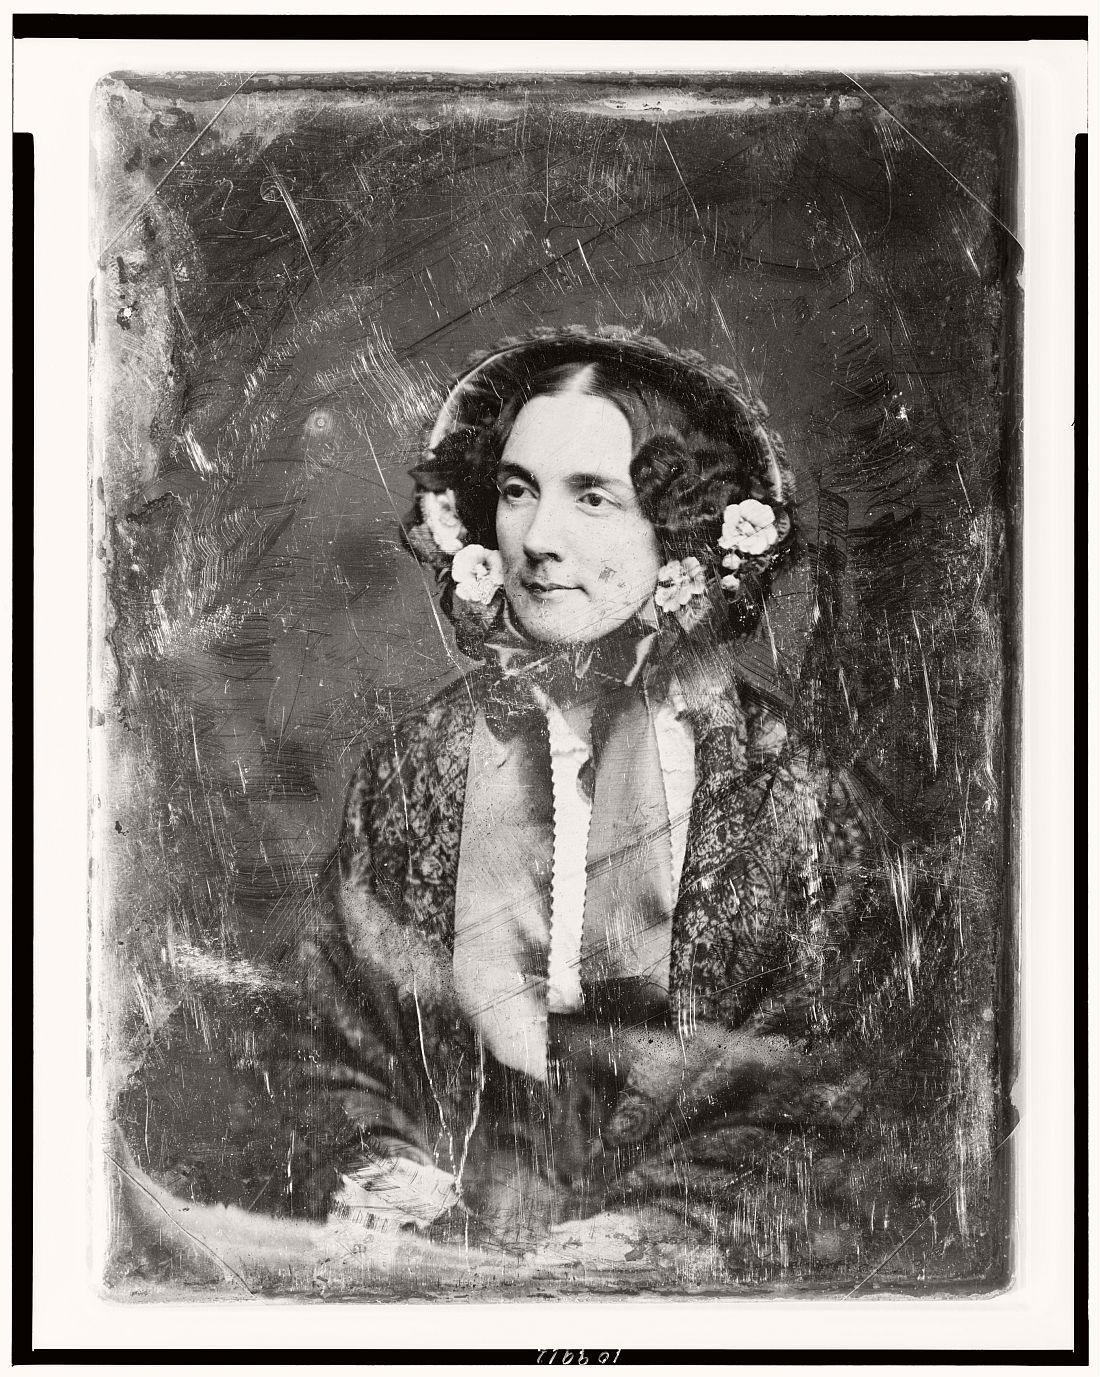 vintage-daguerreotype-portraits-from-xix-century-1844-1860-21